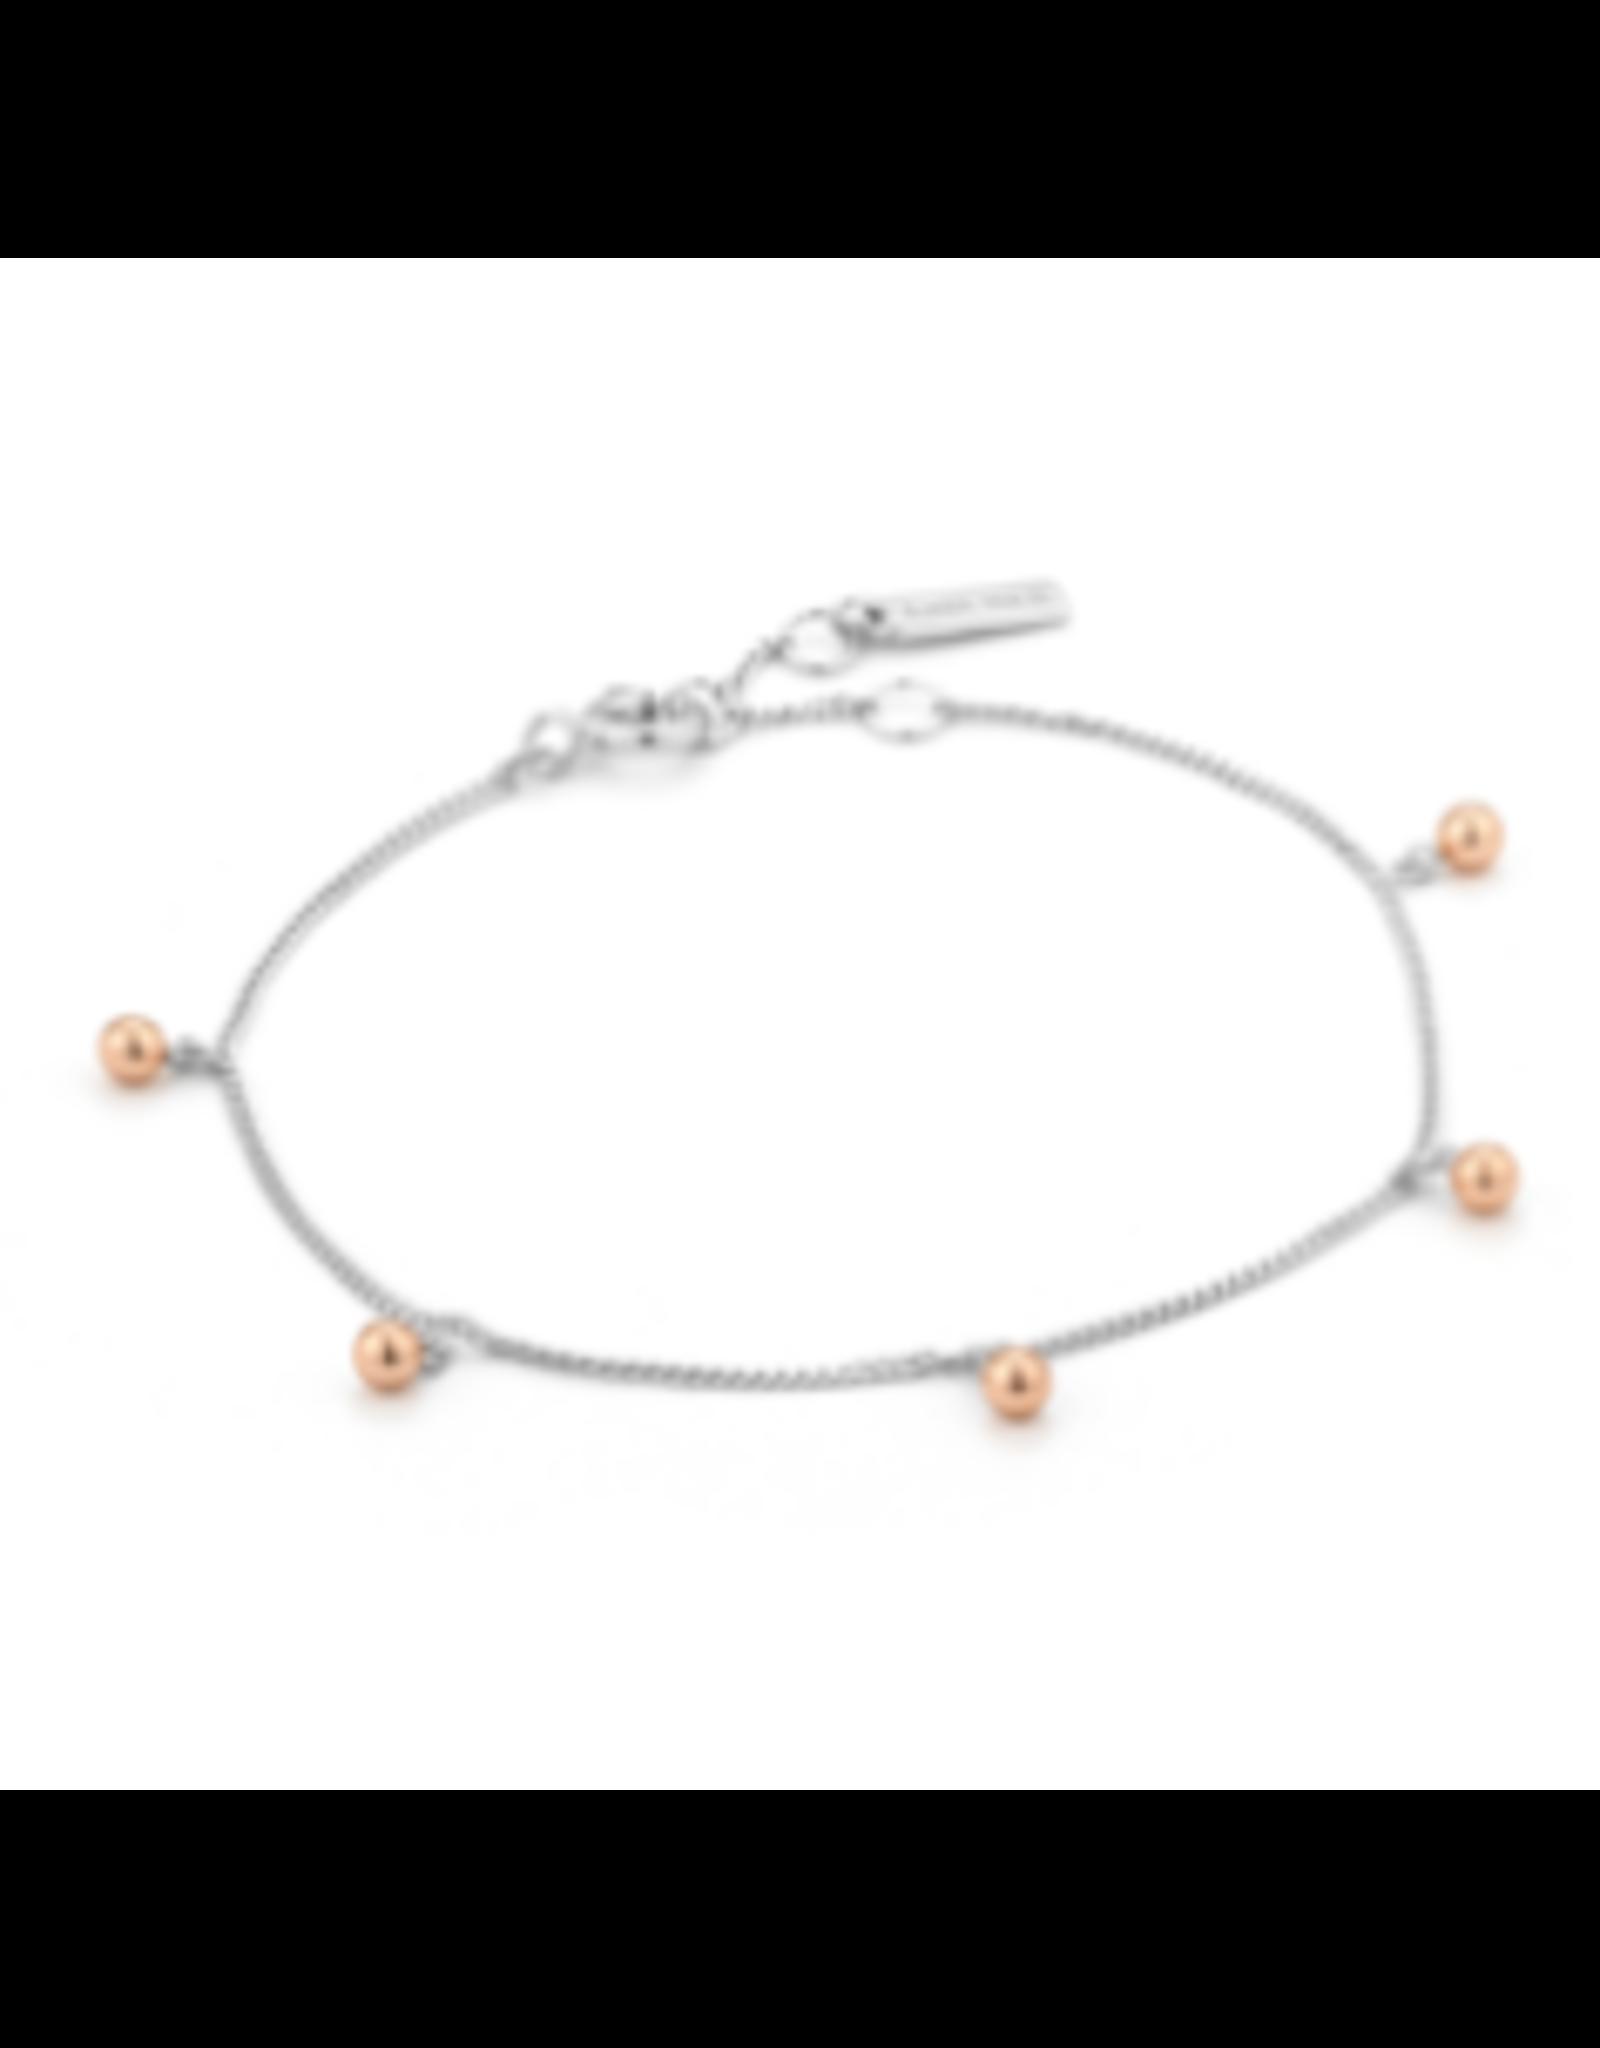 Orbit Drop Balls Bracelet, silver & rose gold